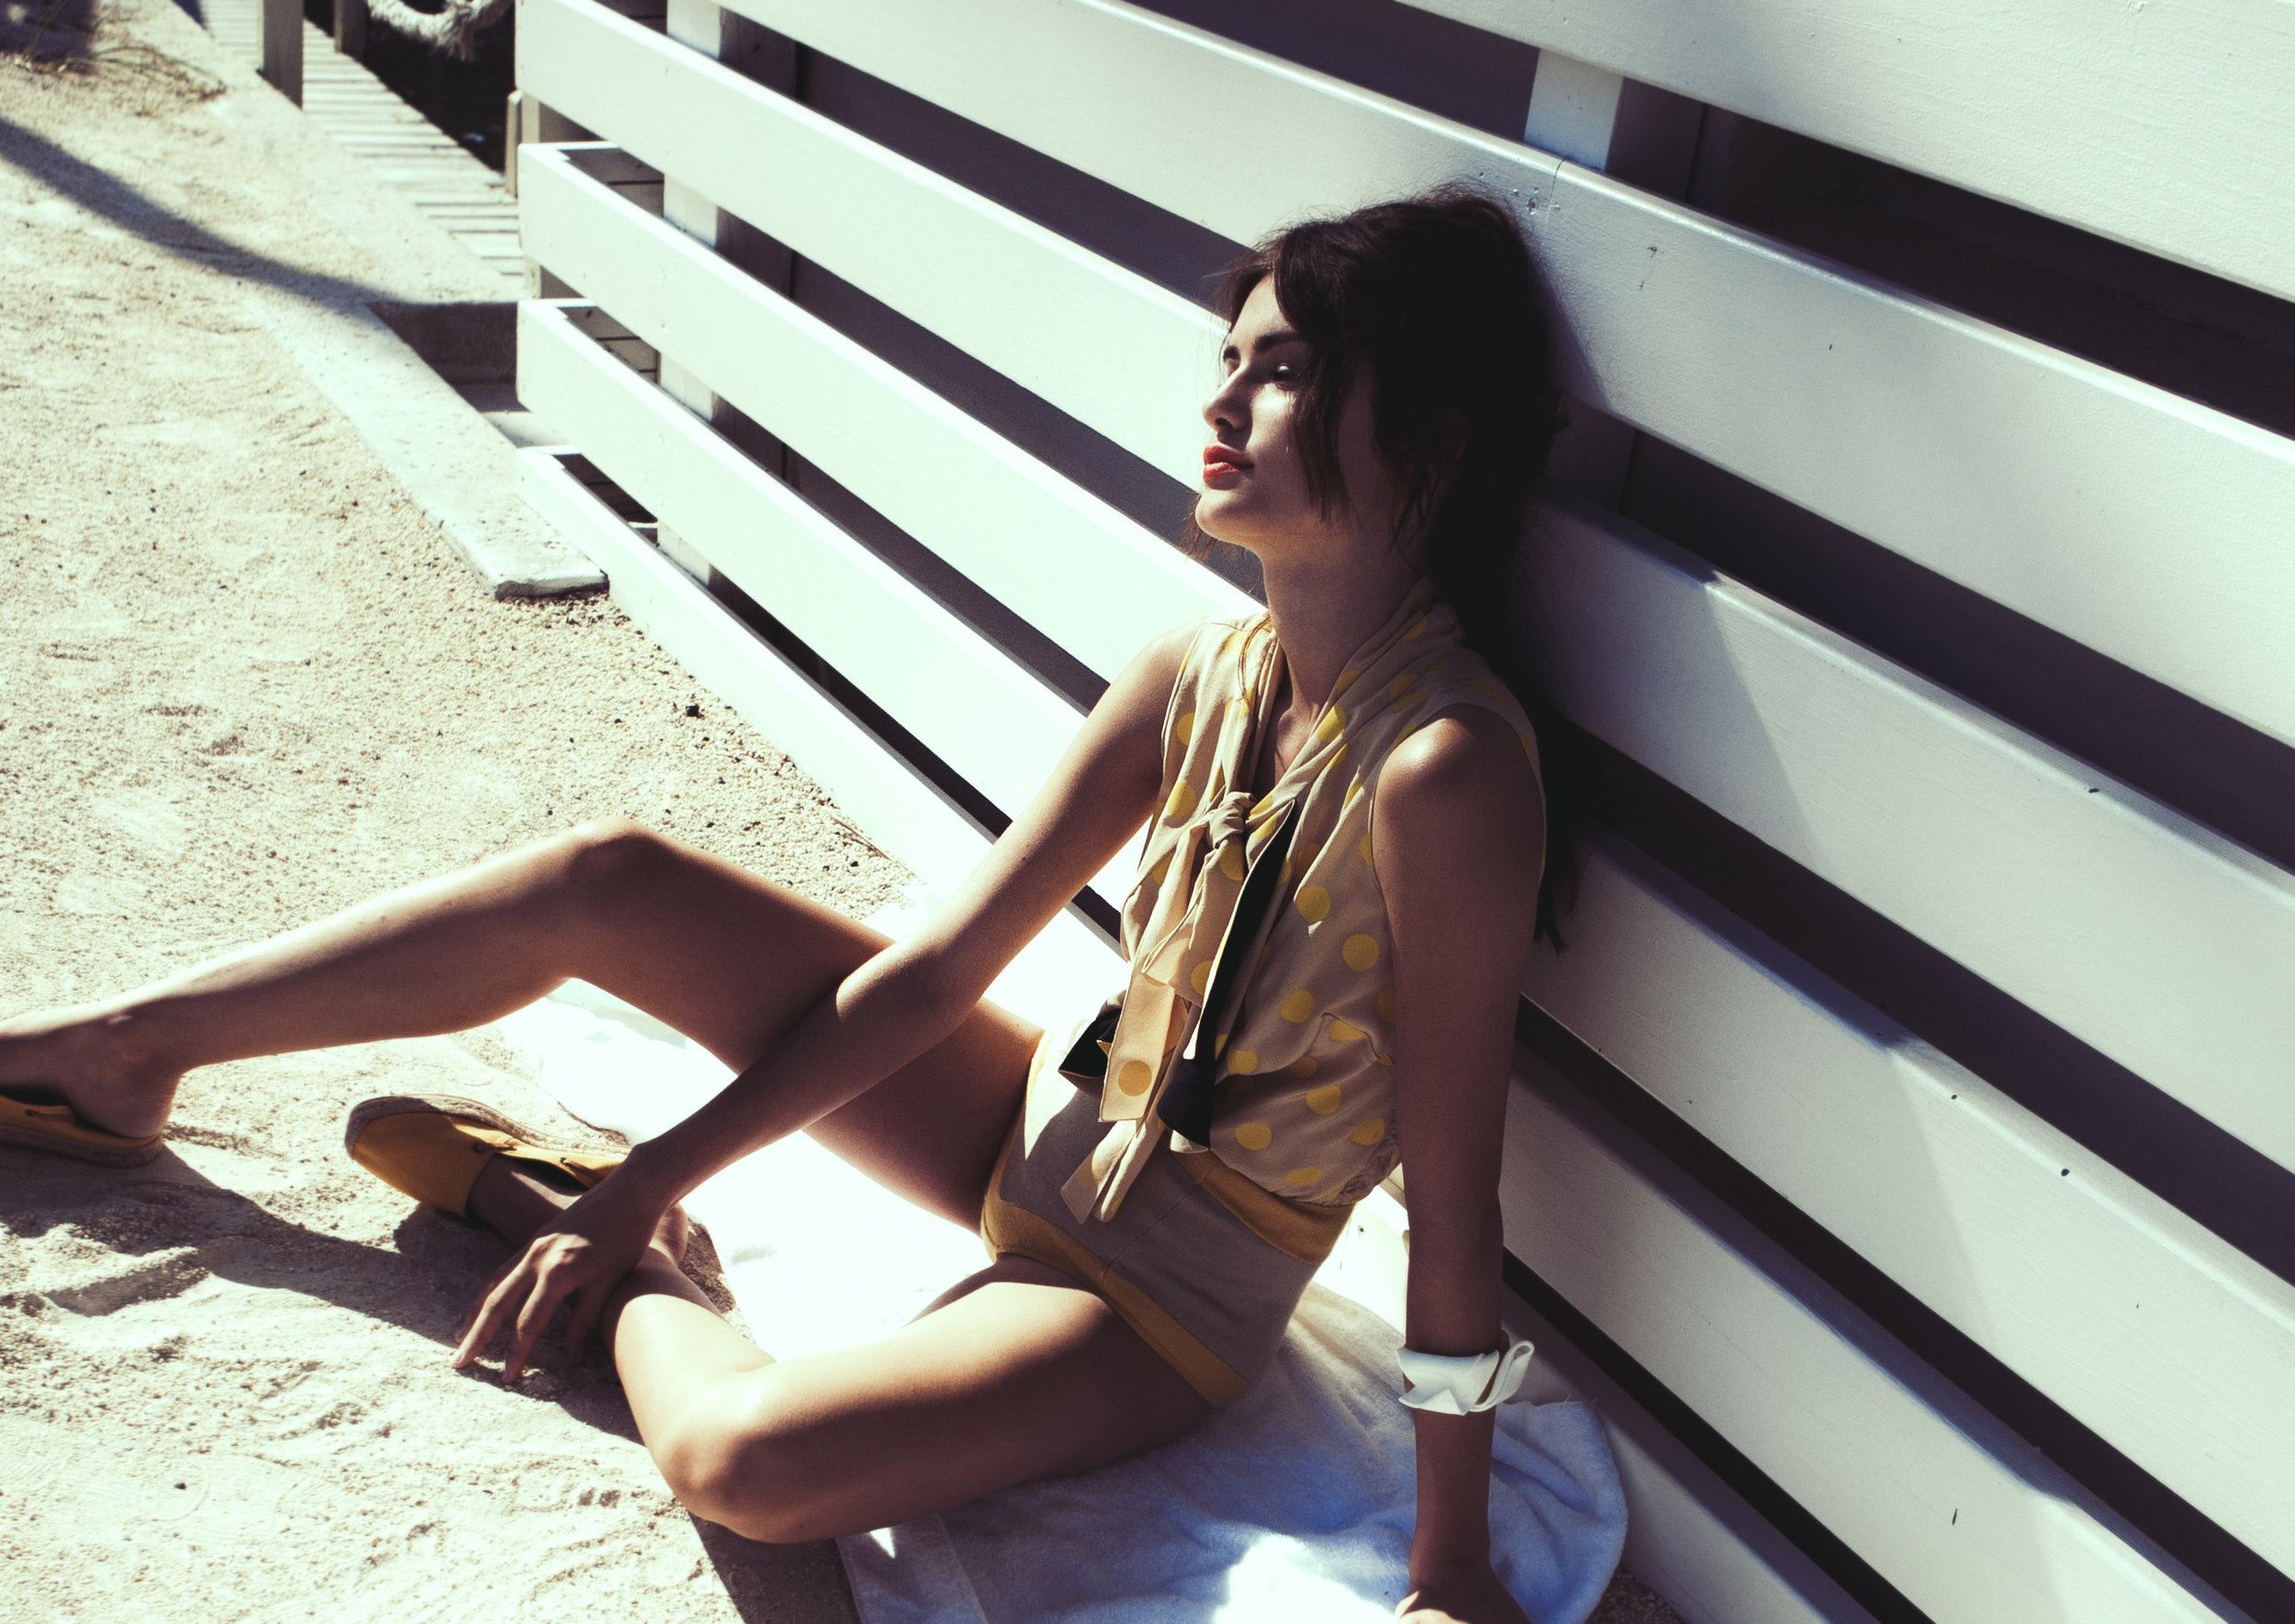 glamour_06.jpg